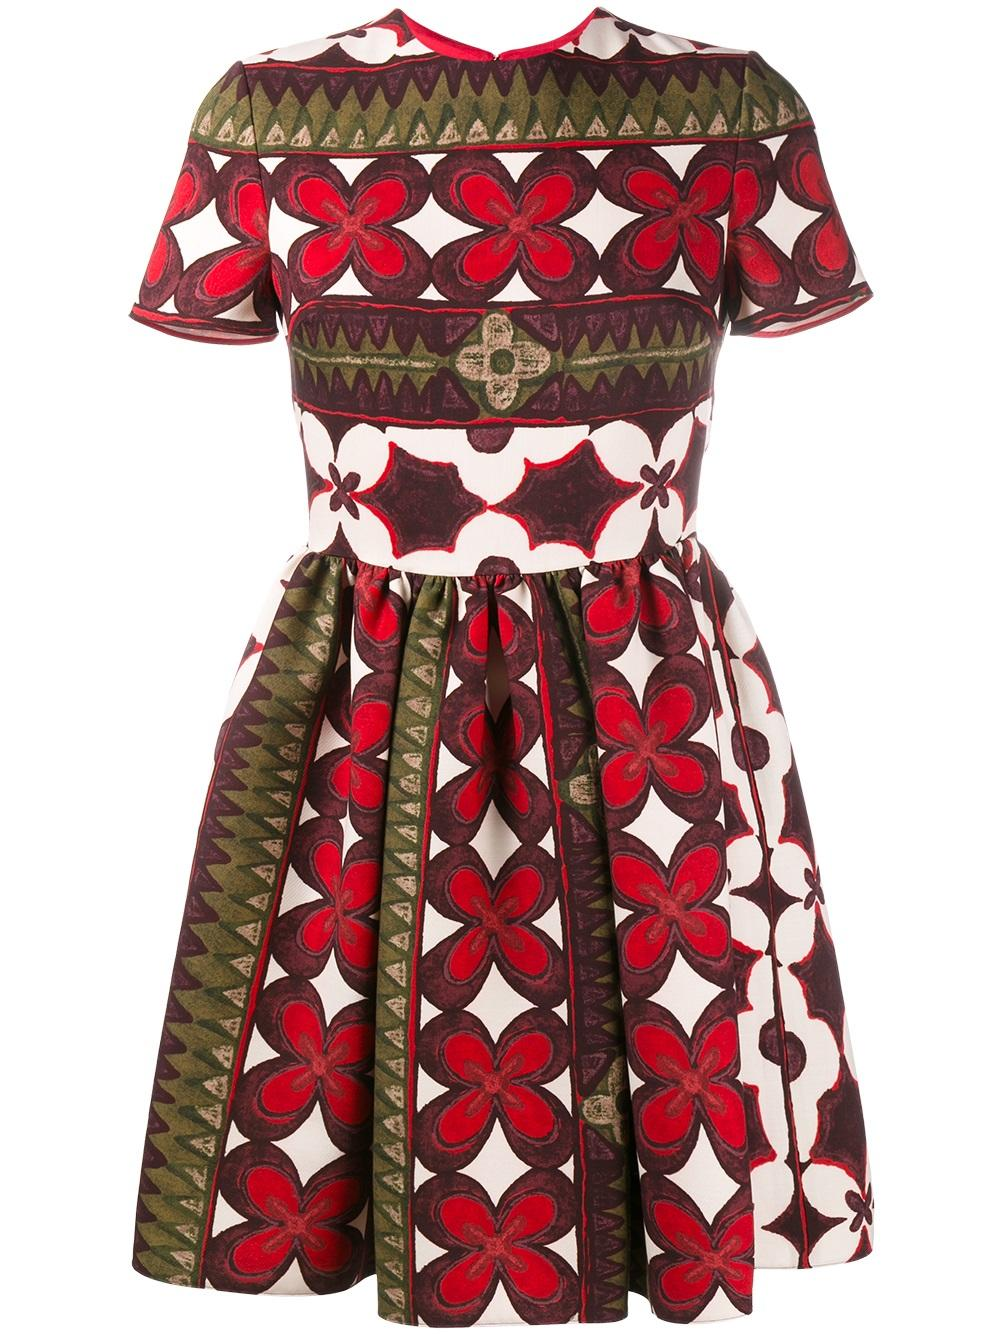 Valentino floral print bambolina dress - Valentino dresses